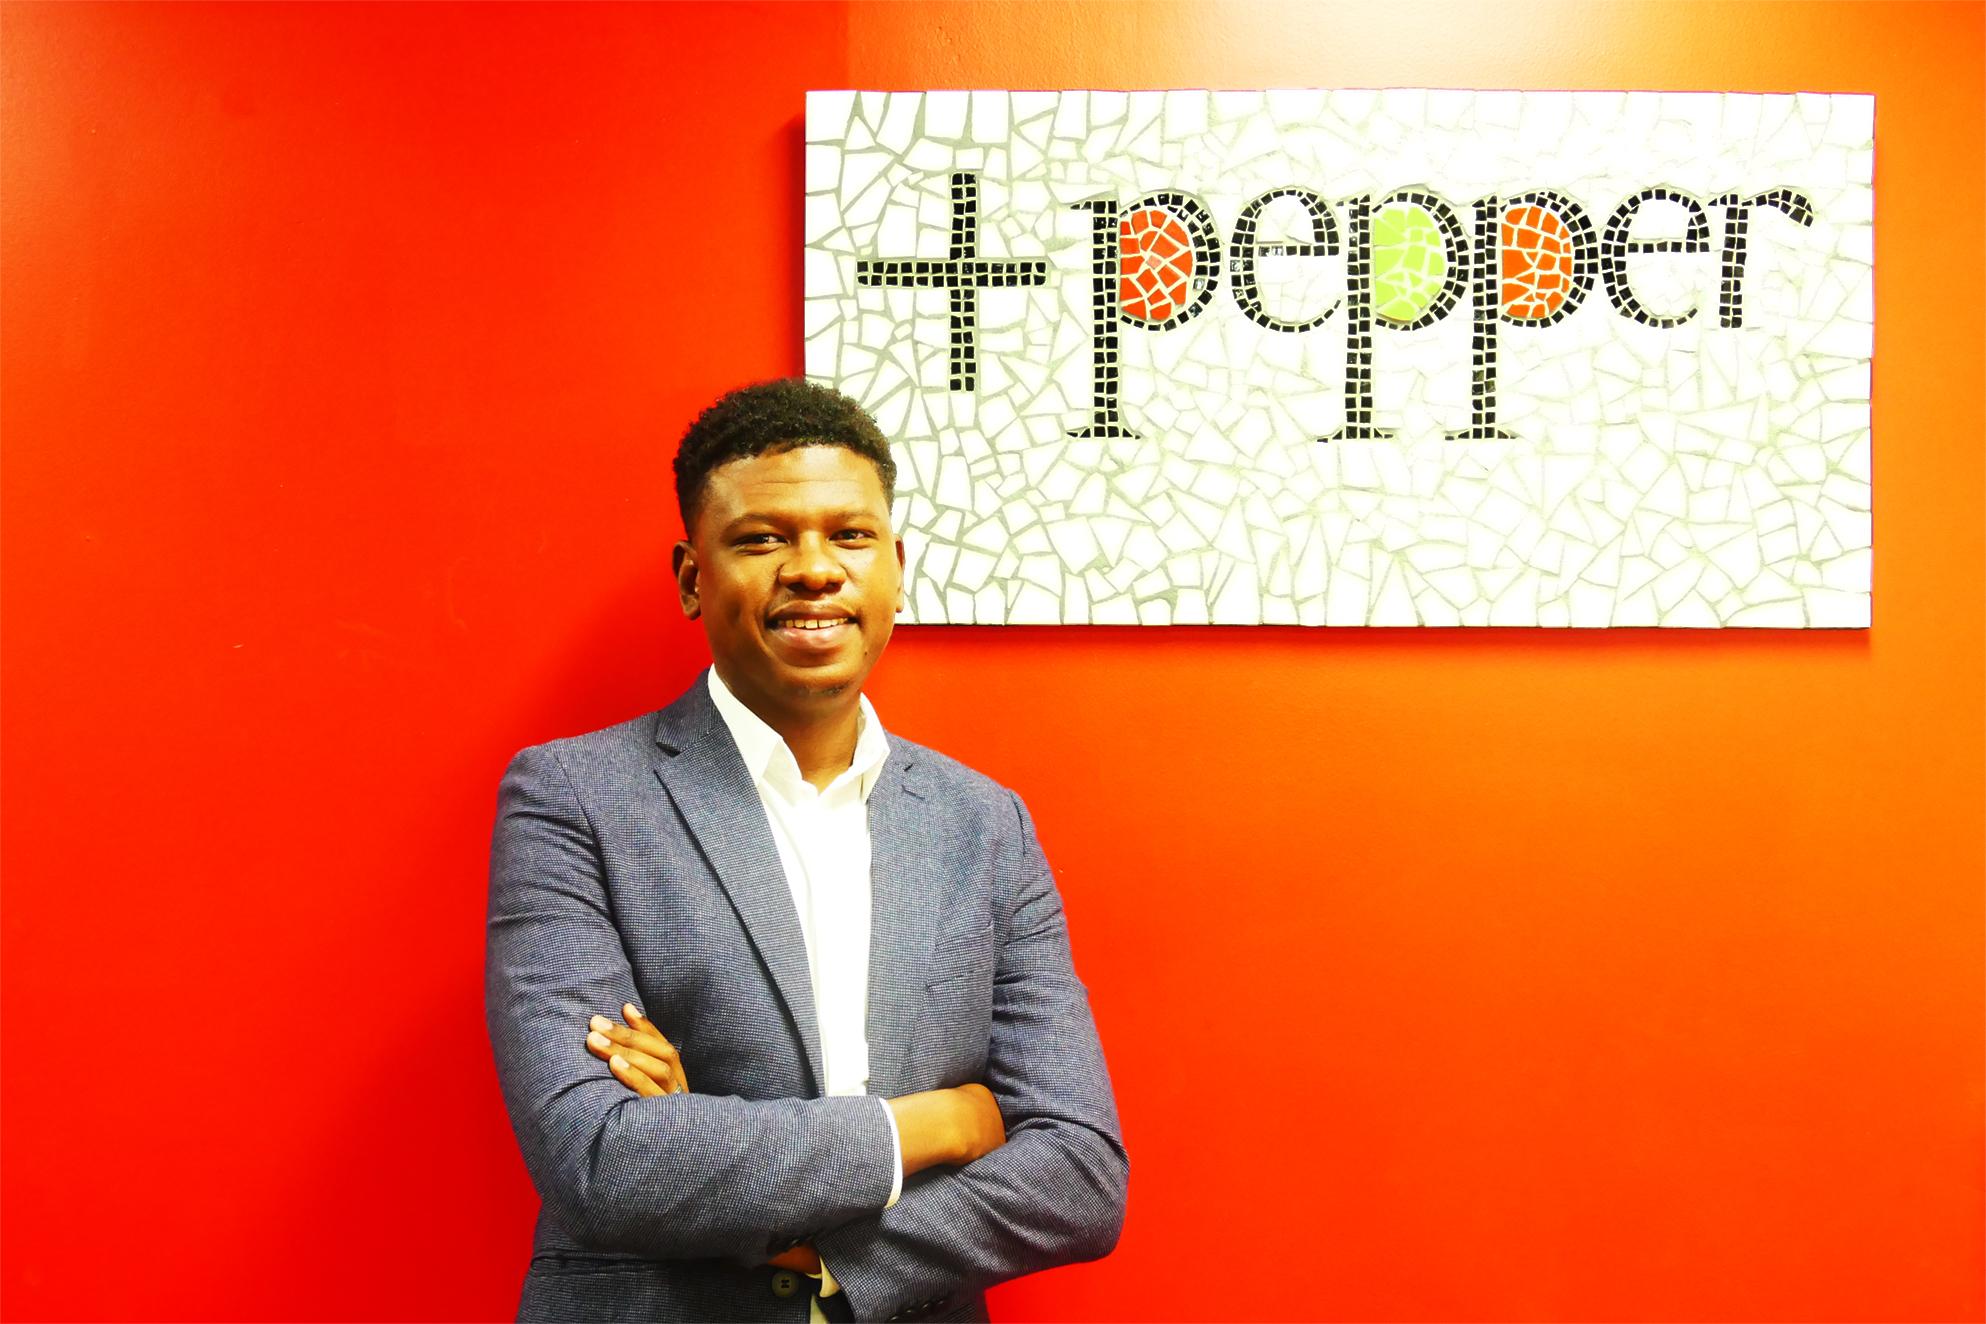 Manager - Digital Marketing - Akil Edwards